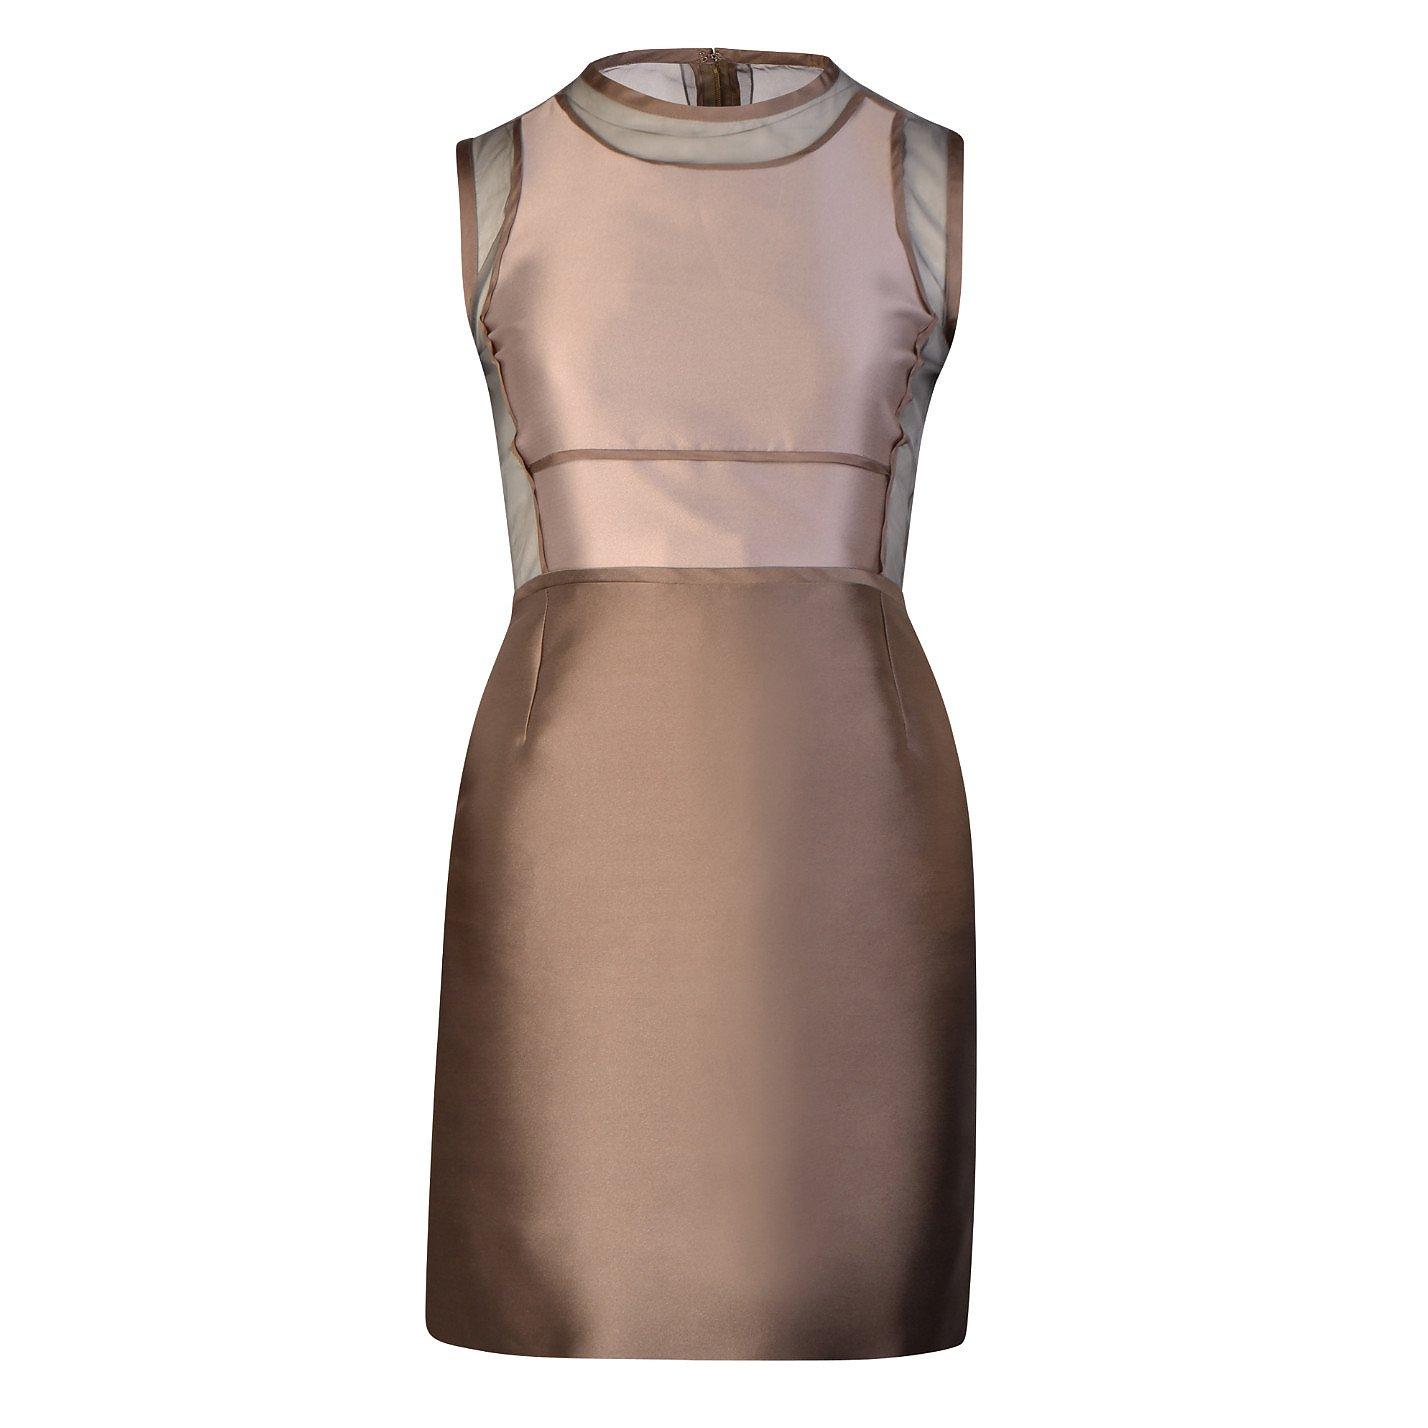 Victoria, Victoria Beckham Sheer Bodice Mini Dress